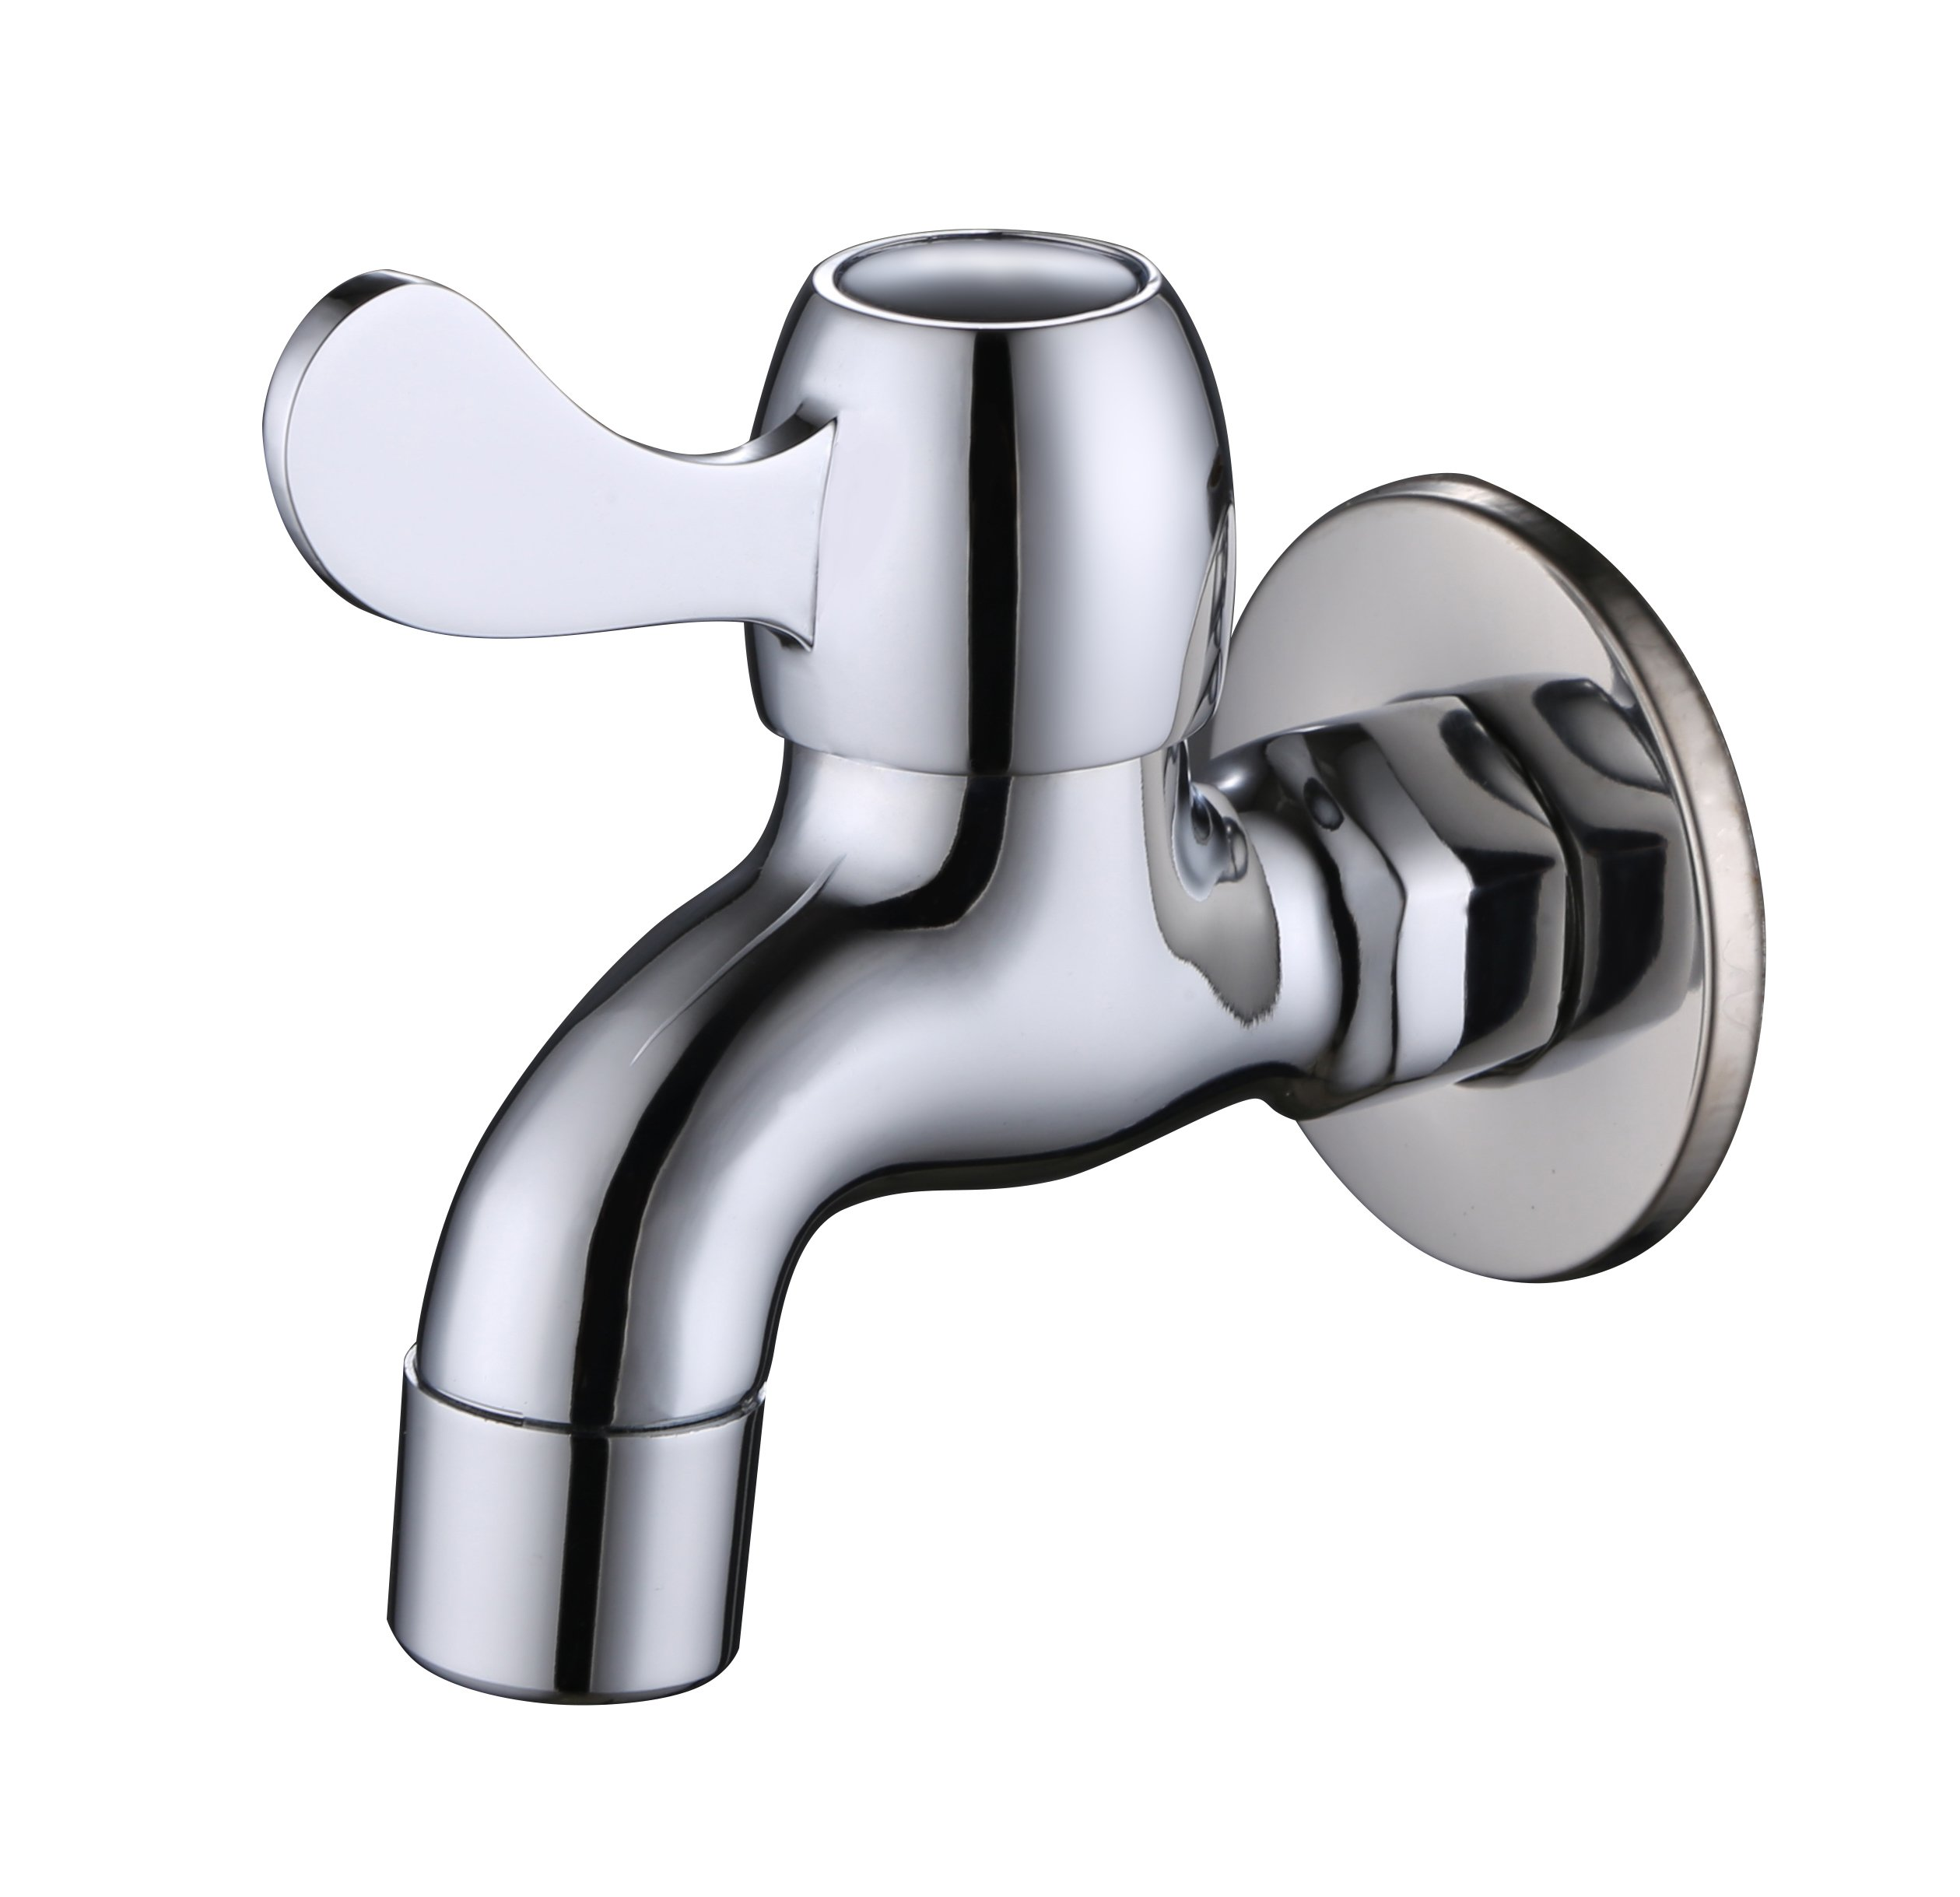 Merveilleux Get Quotations · Frascio Faucet Full Copper Casting Outdoor/Garden/Washing  Machine/Bath Tub Tap Faucet